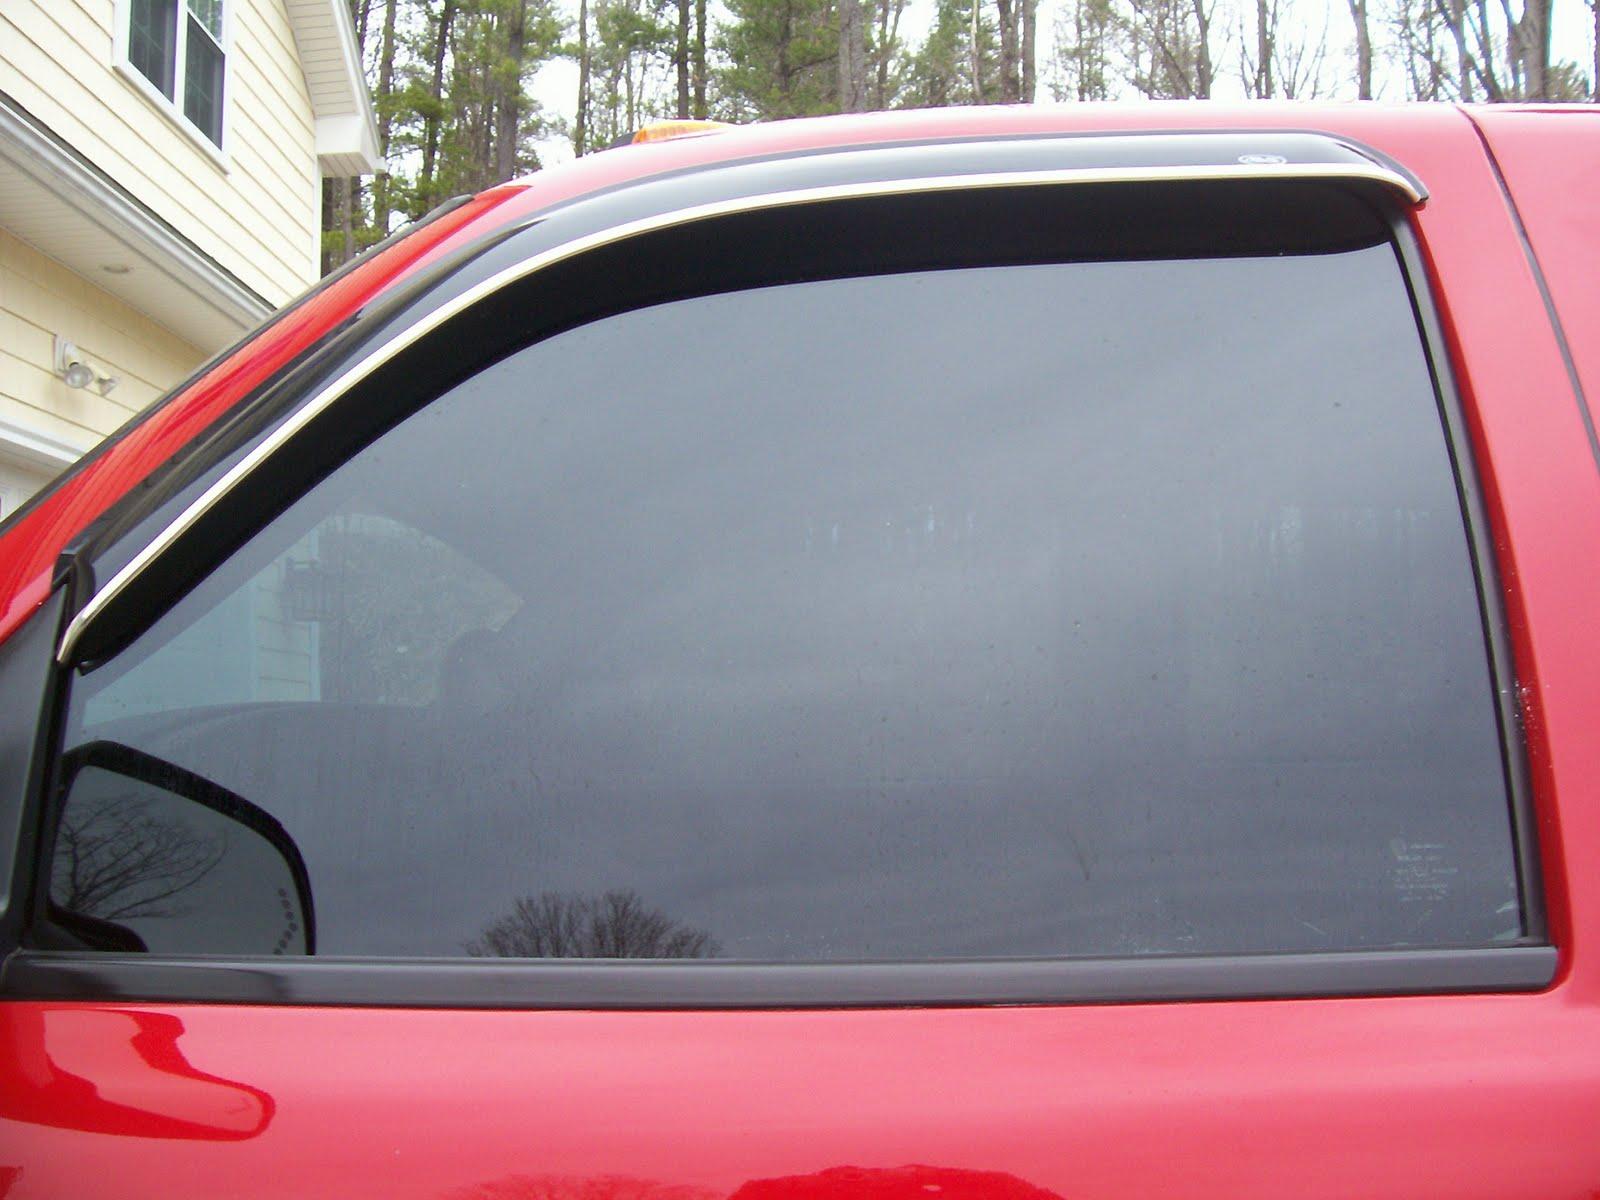 Silverado mods how to tint silverado windows for 100 dollar window tinting